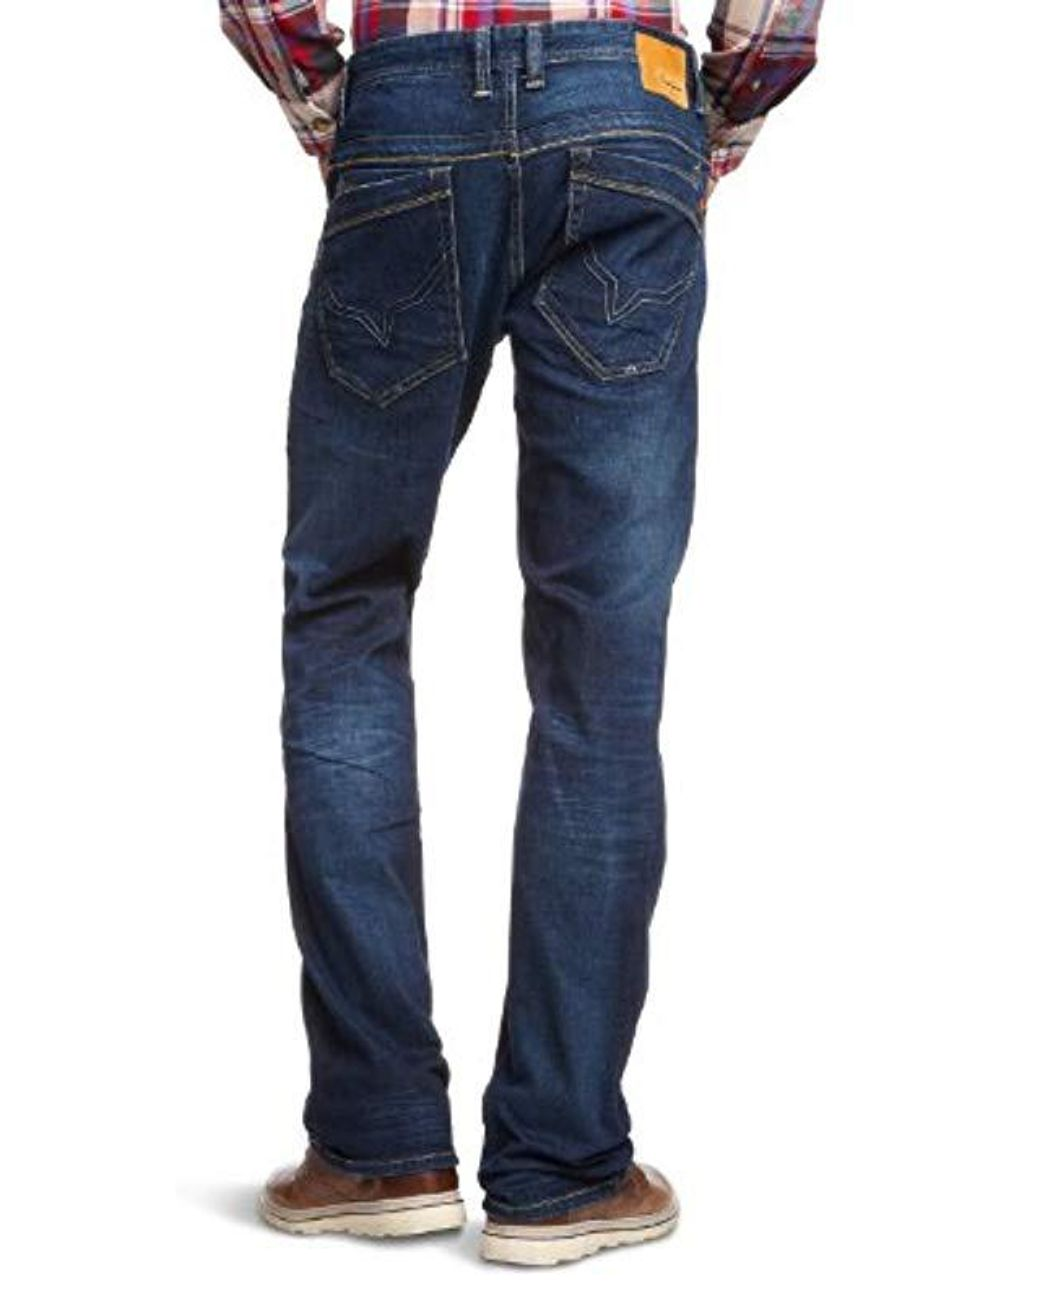 NEU PEPE Jeans KINGSTON Z45 Regular Fit Dunkelblau